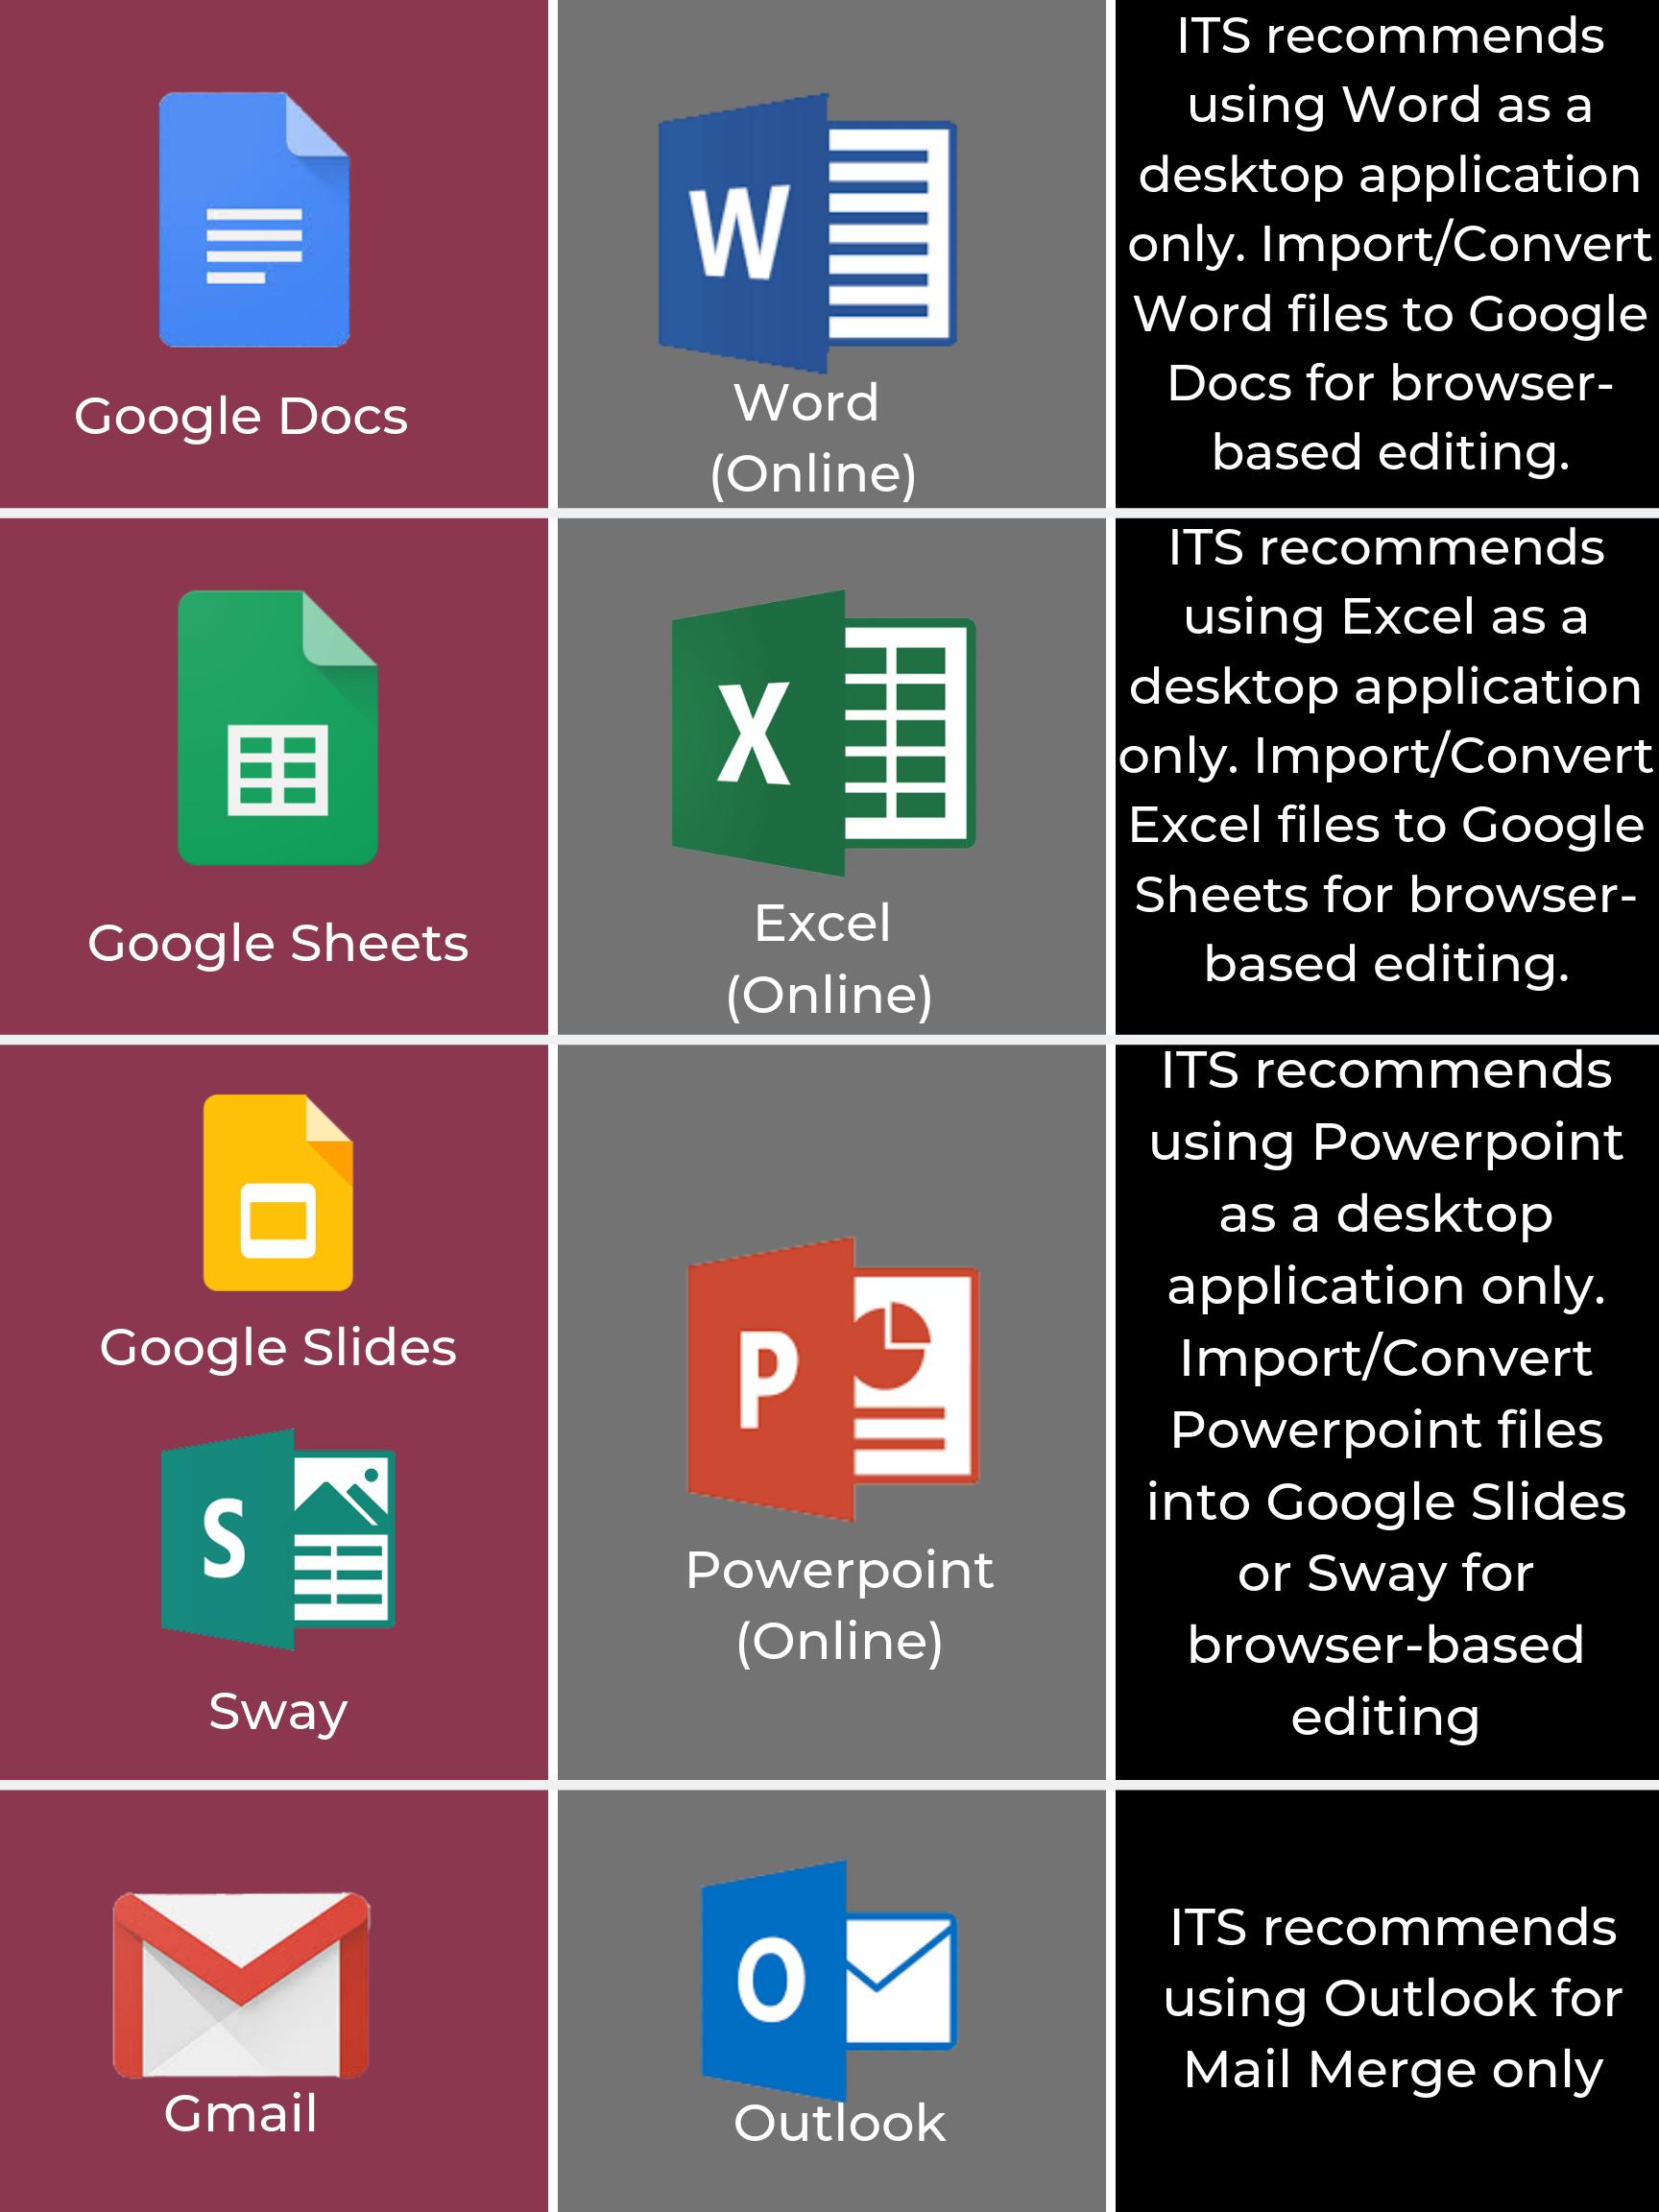 G Suite v. Microsoft 365